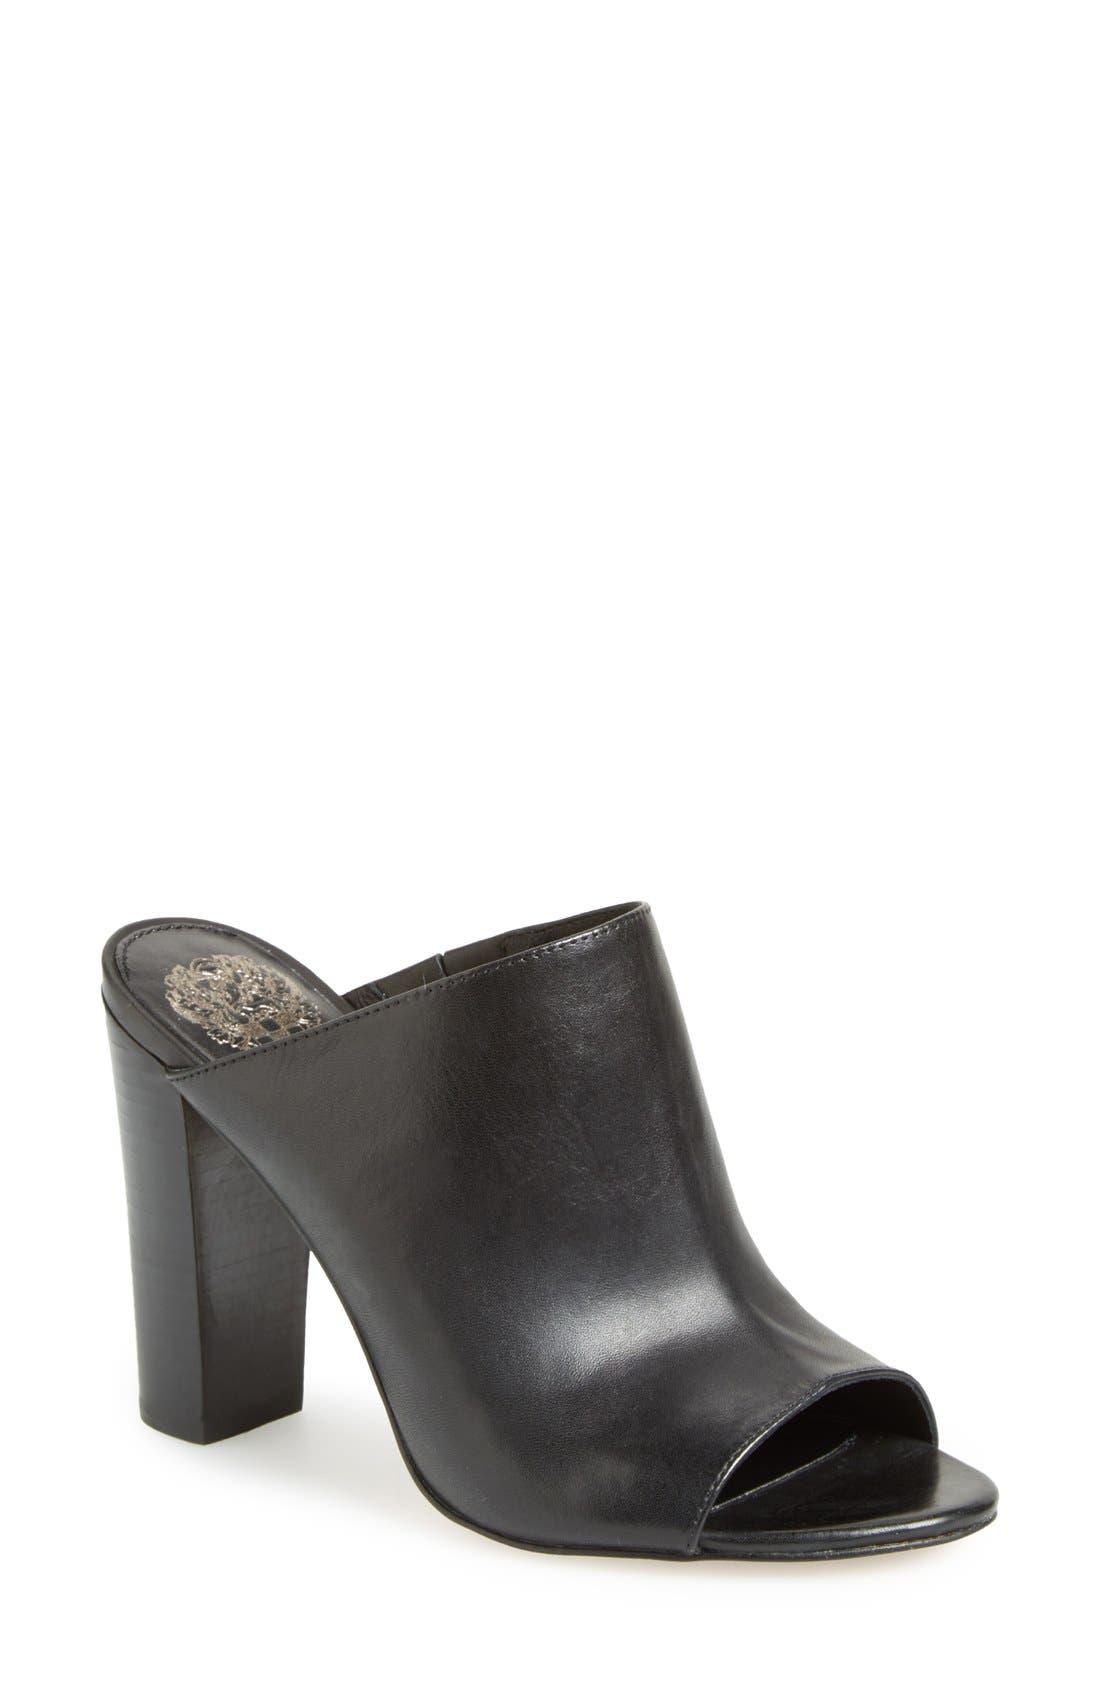 VINCE CAMUTO 'Vestata' Leather Peep Toe Mule, Main, color, 001